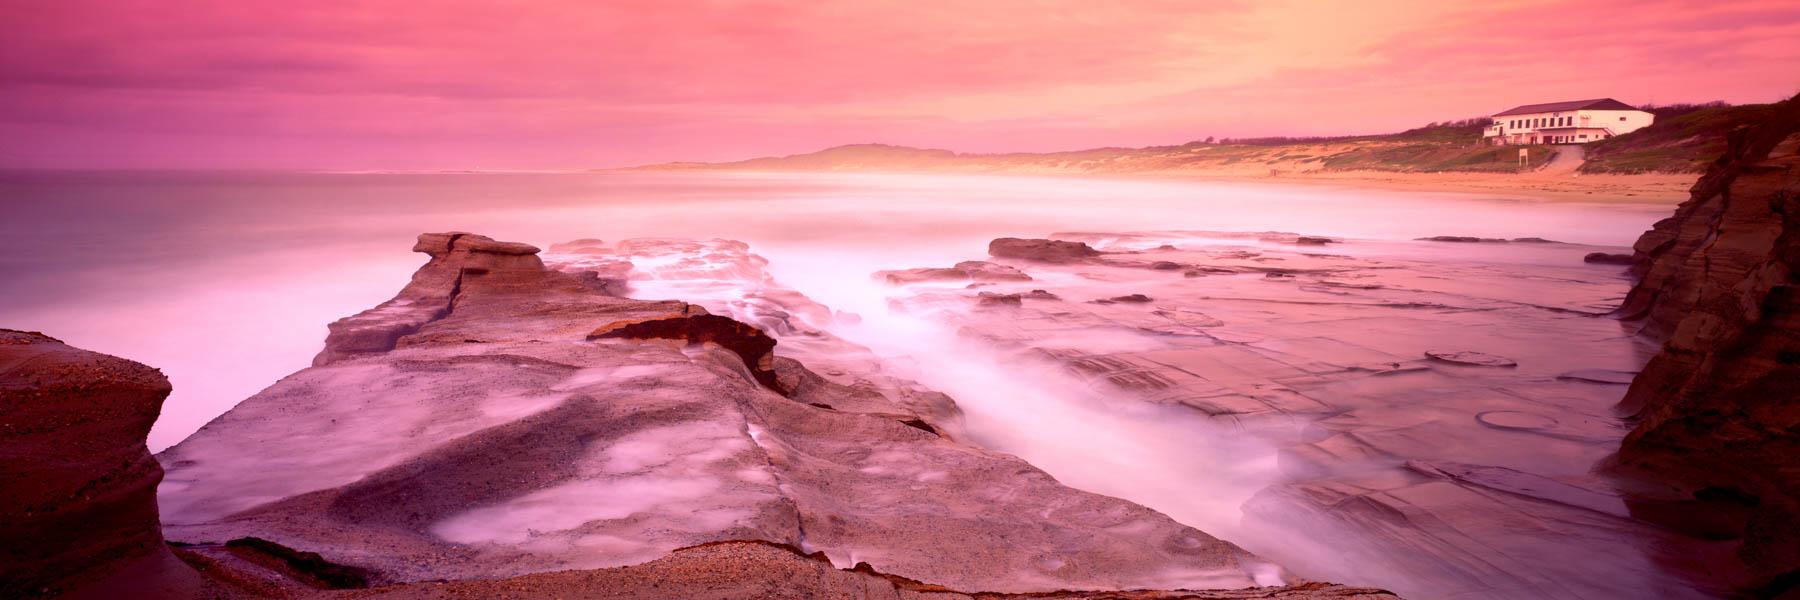 A stormy pastel sunrise at Soildiers Beach, Centgral Coast, NSW, Australia.